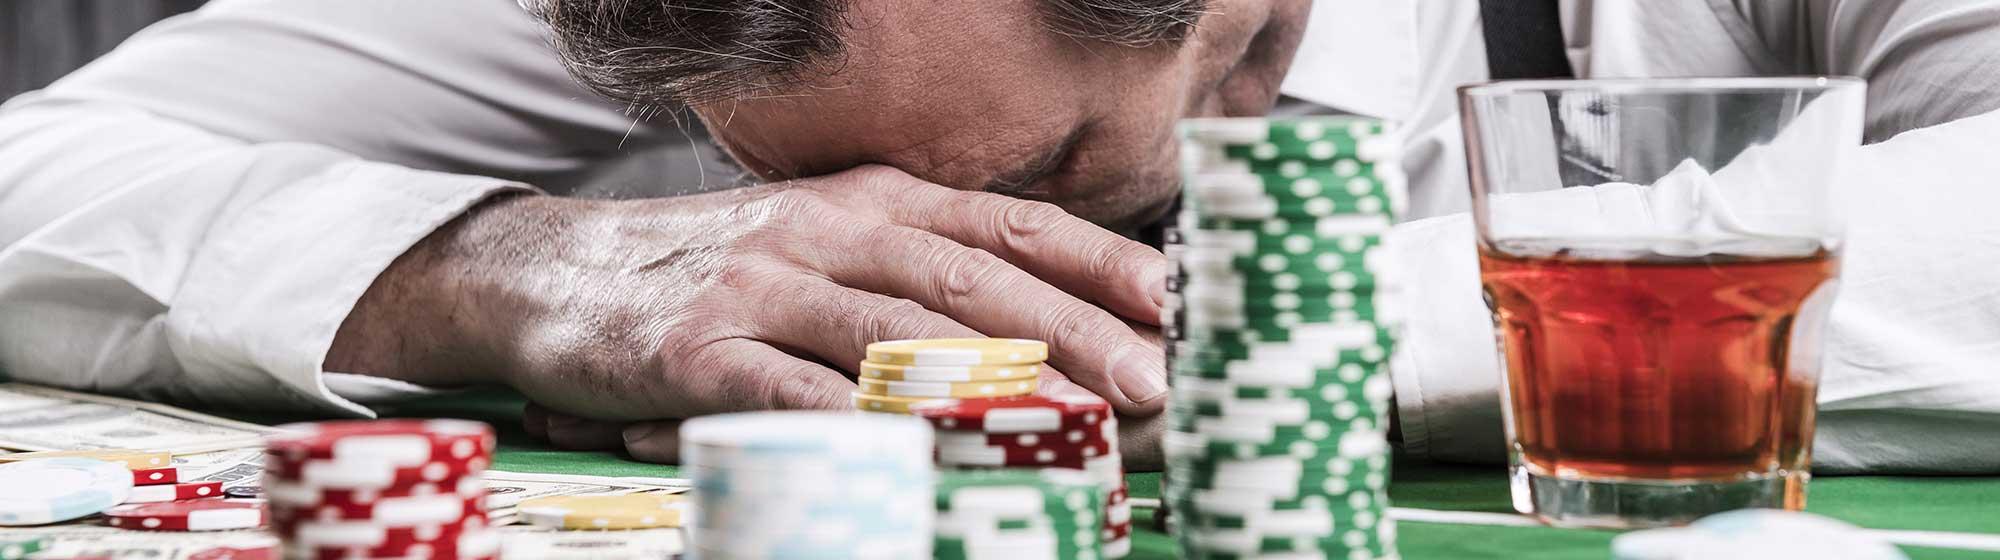 Debt enforceable gambling gambling blackjack roulette casino